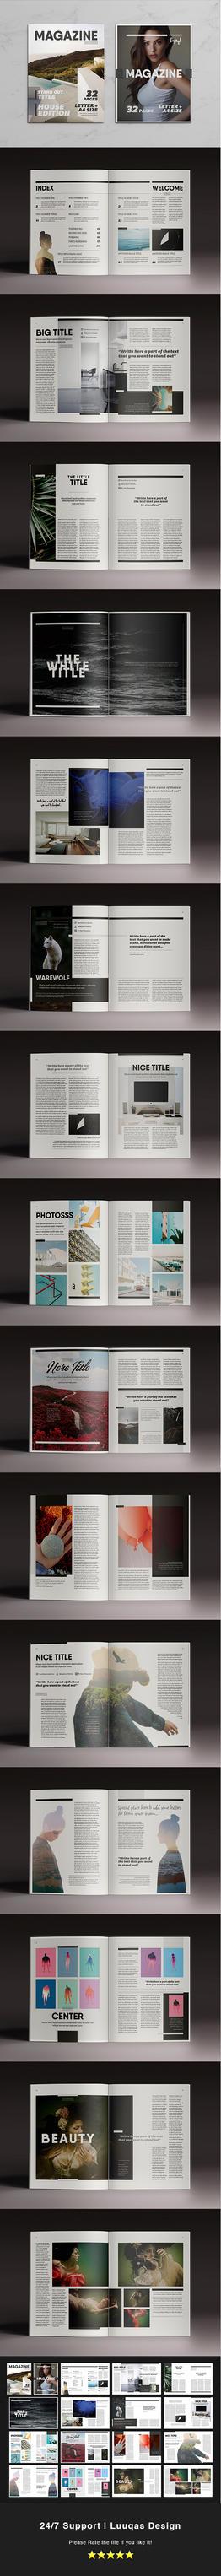 Multipurpose Magazine 7 Template by luuqas